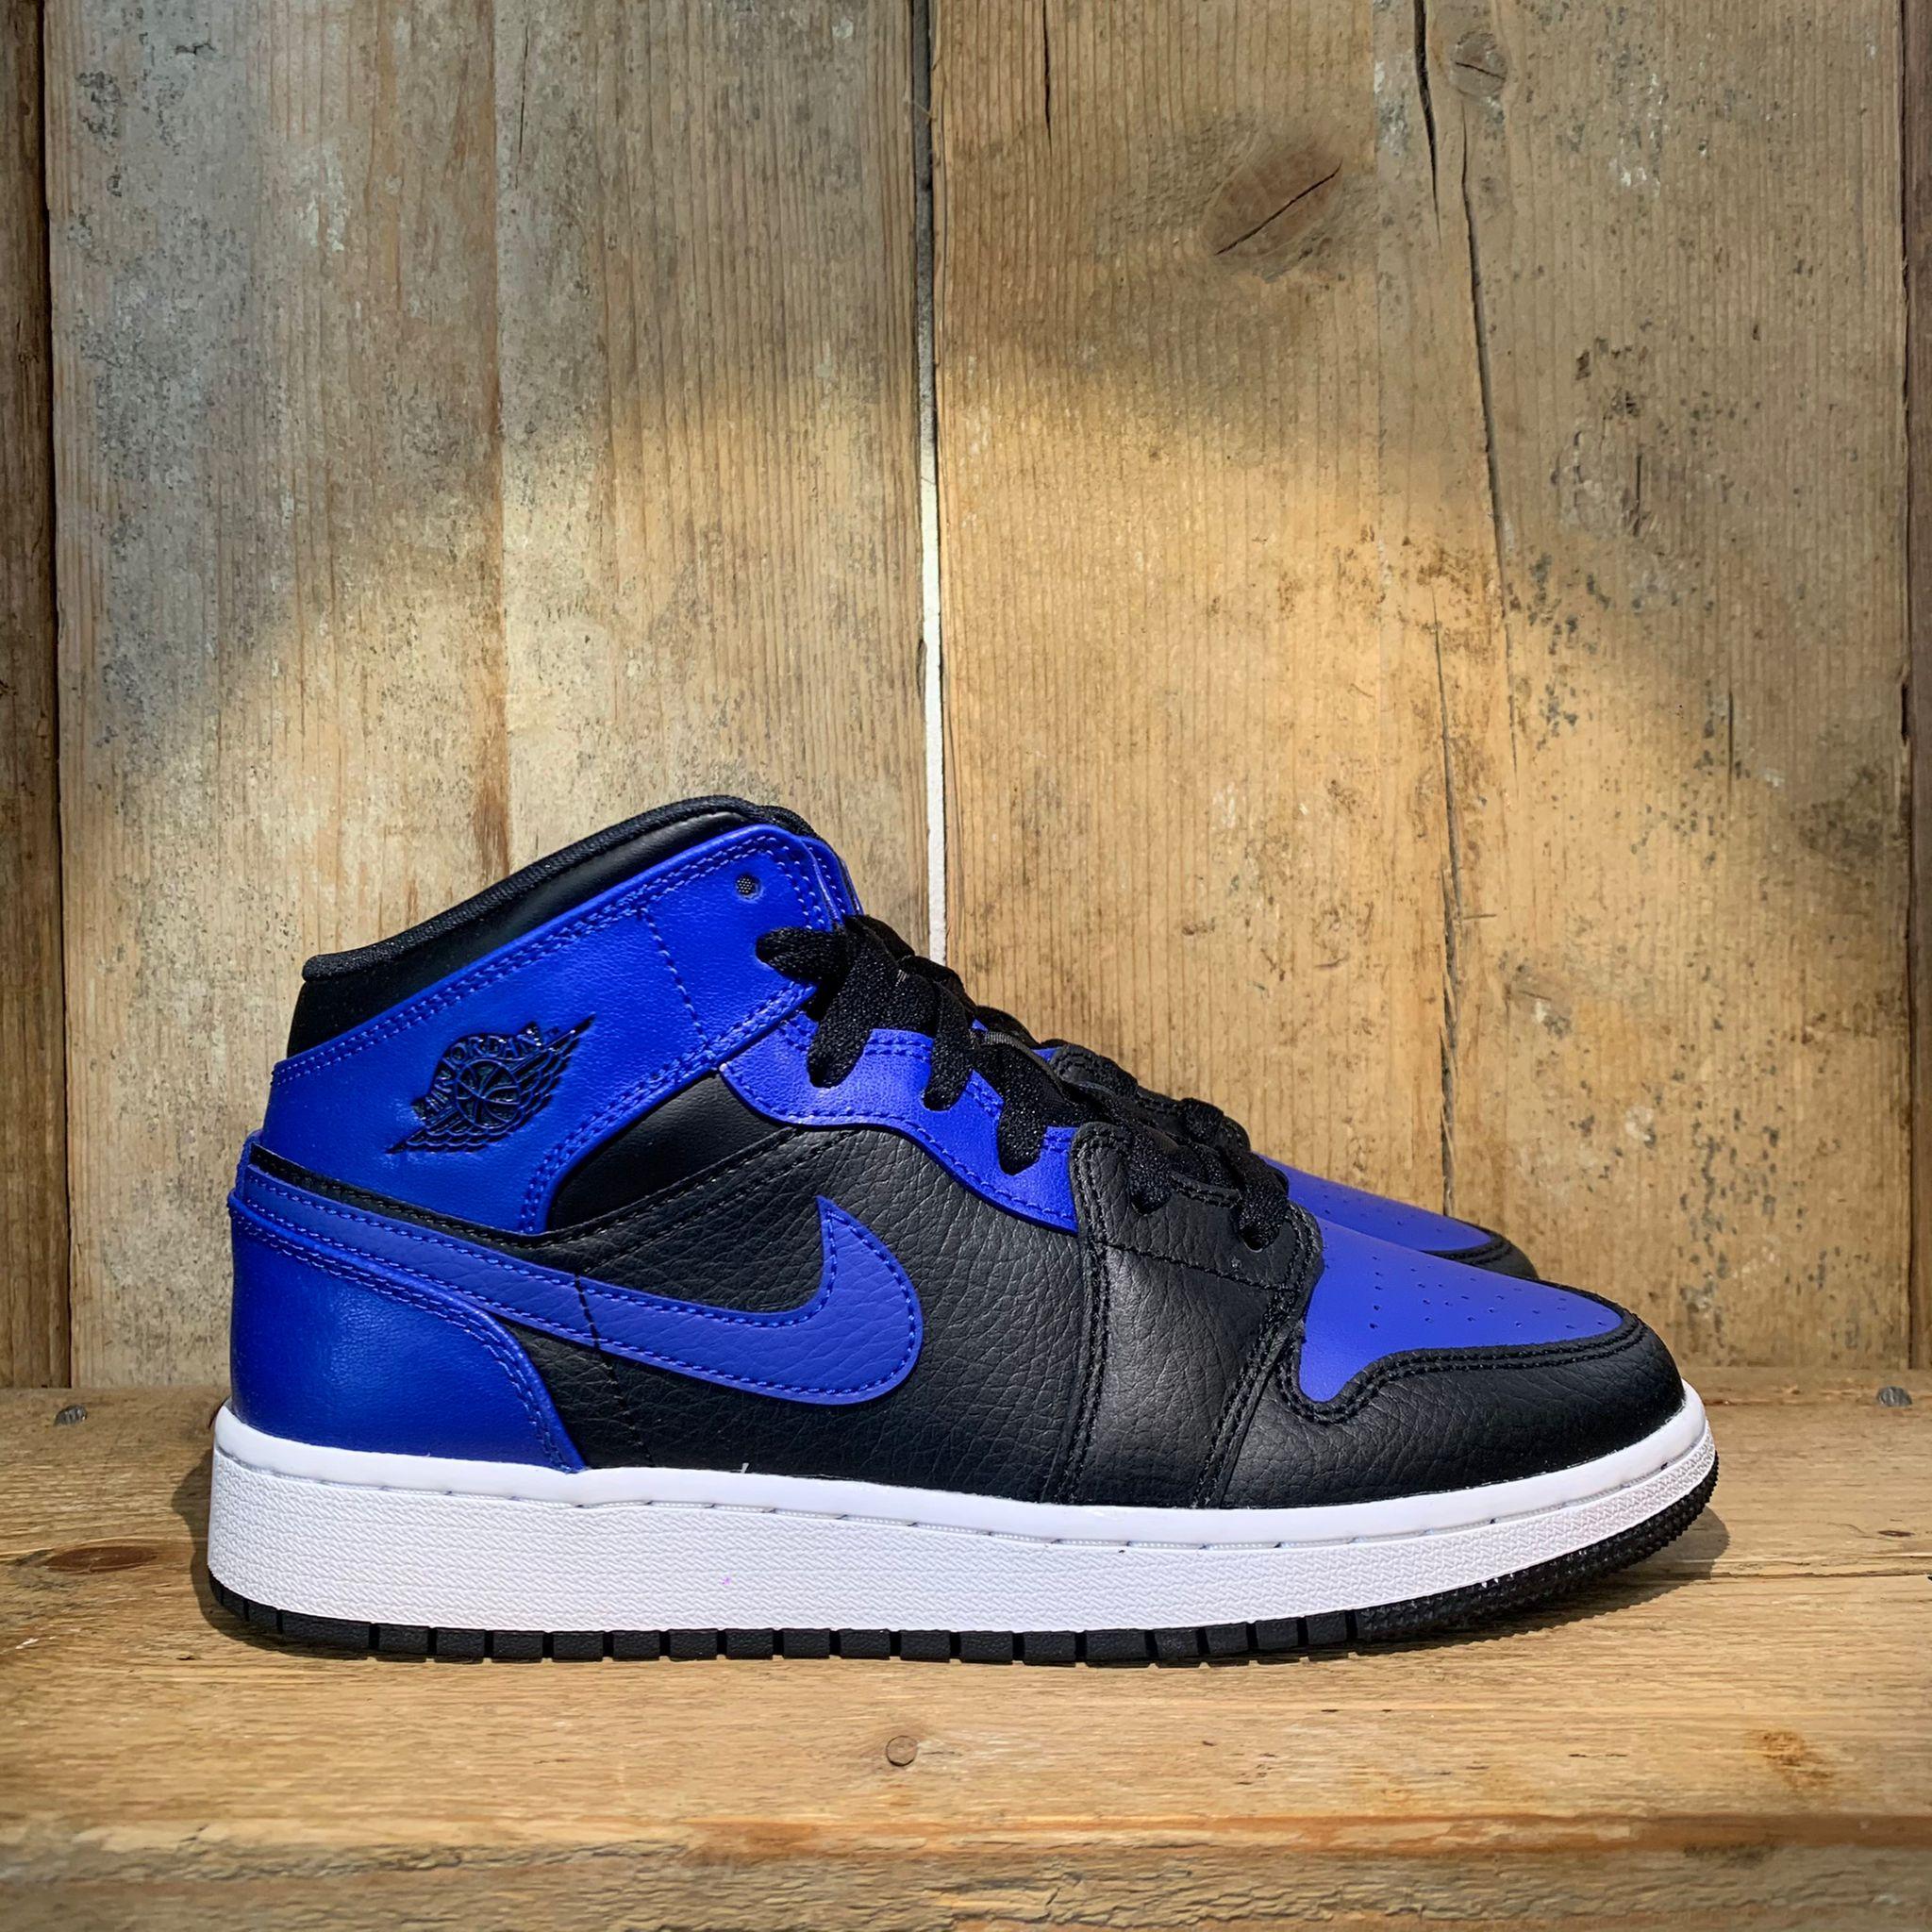 Scarpa Air Jordan 1 Mid (Gs) Blu Royal E Nera